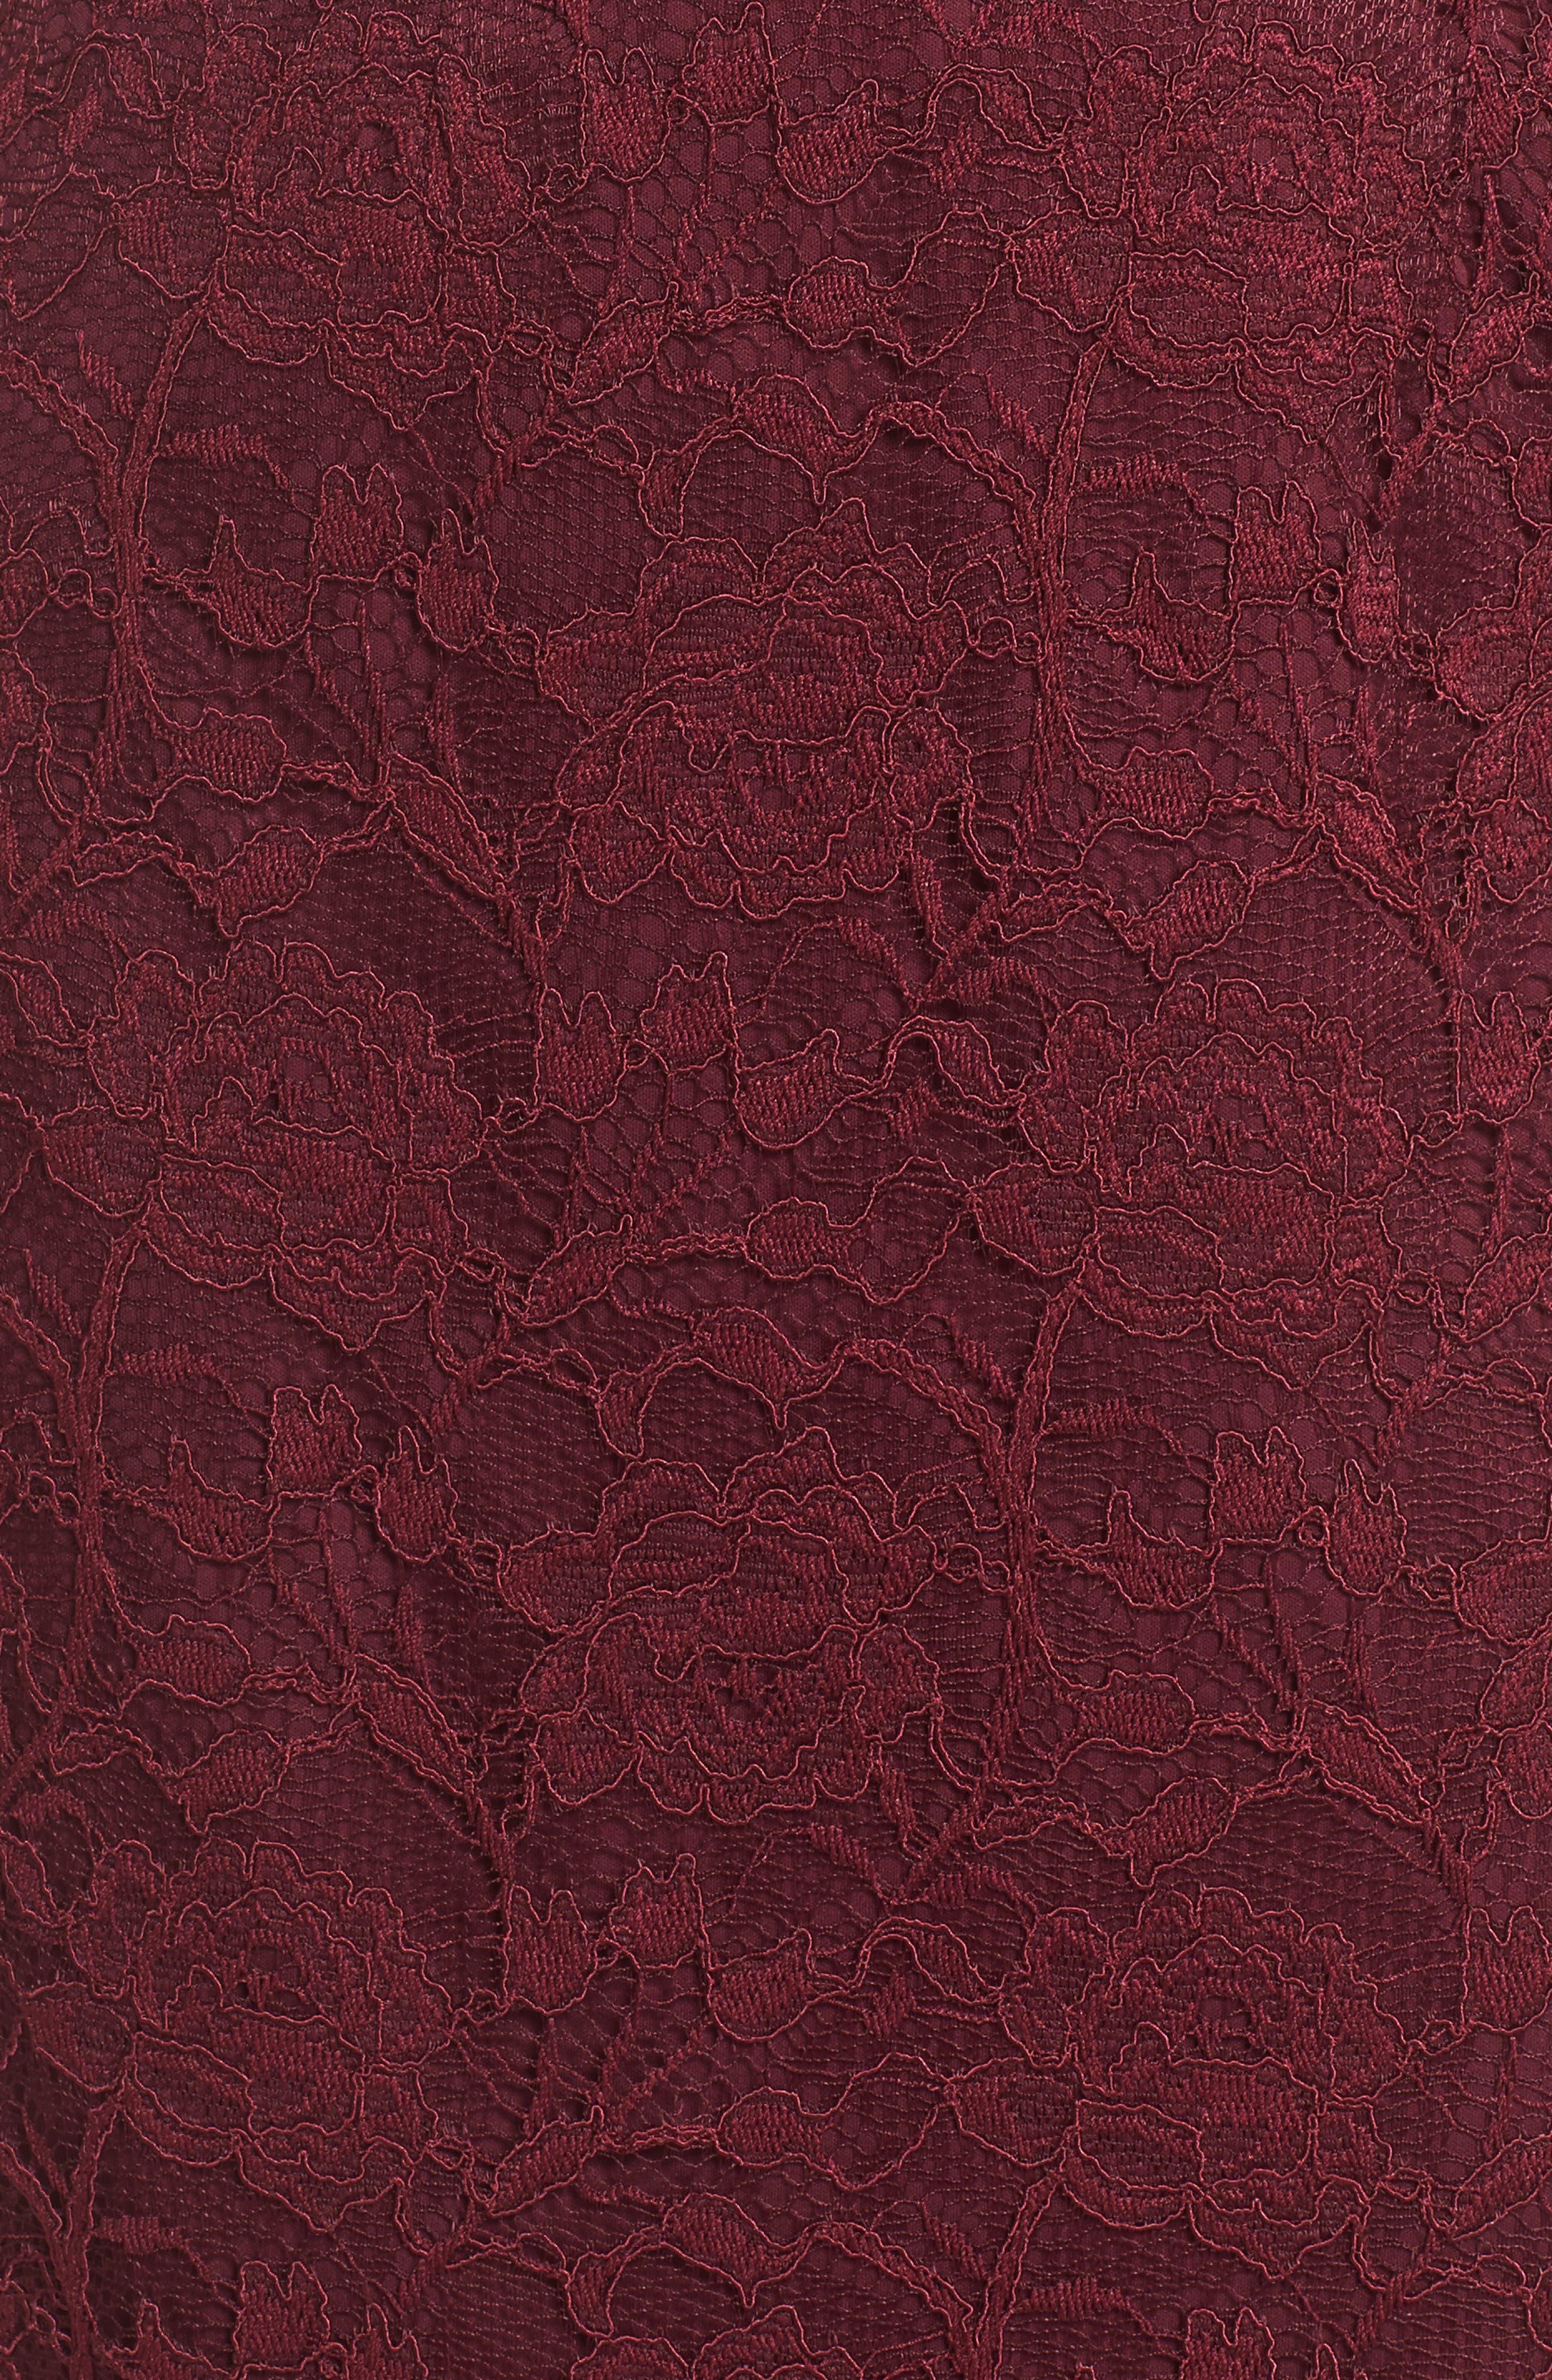 Rose Lace Sheath Dress,                             Alternate thumbnail 5, color,                             Cabernet